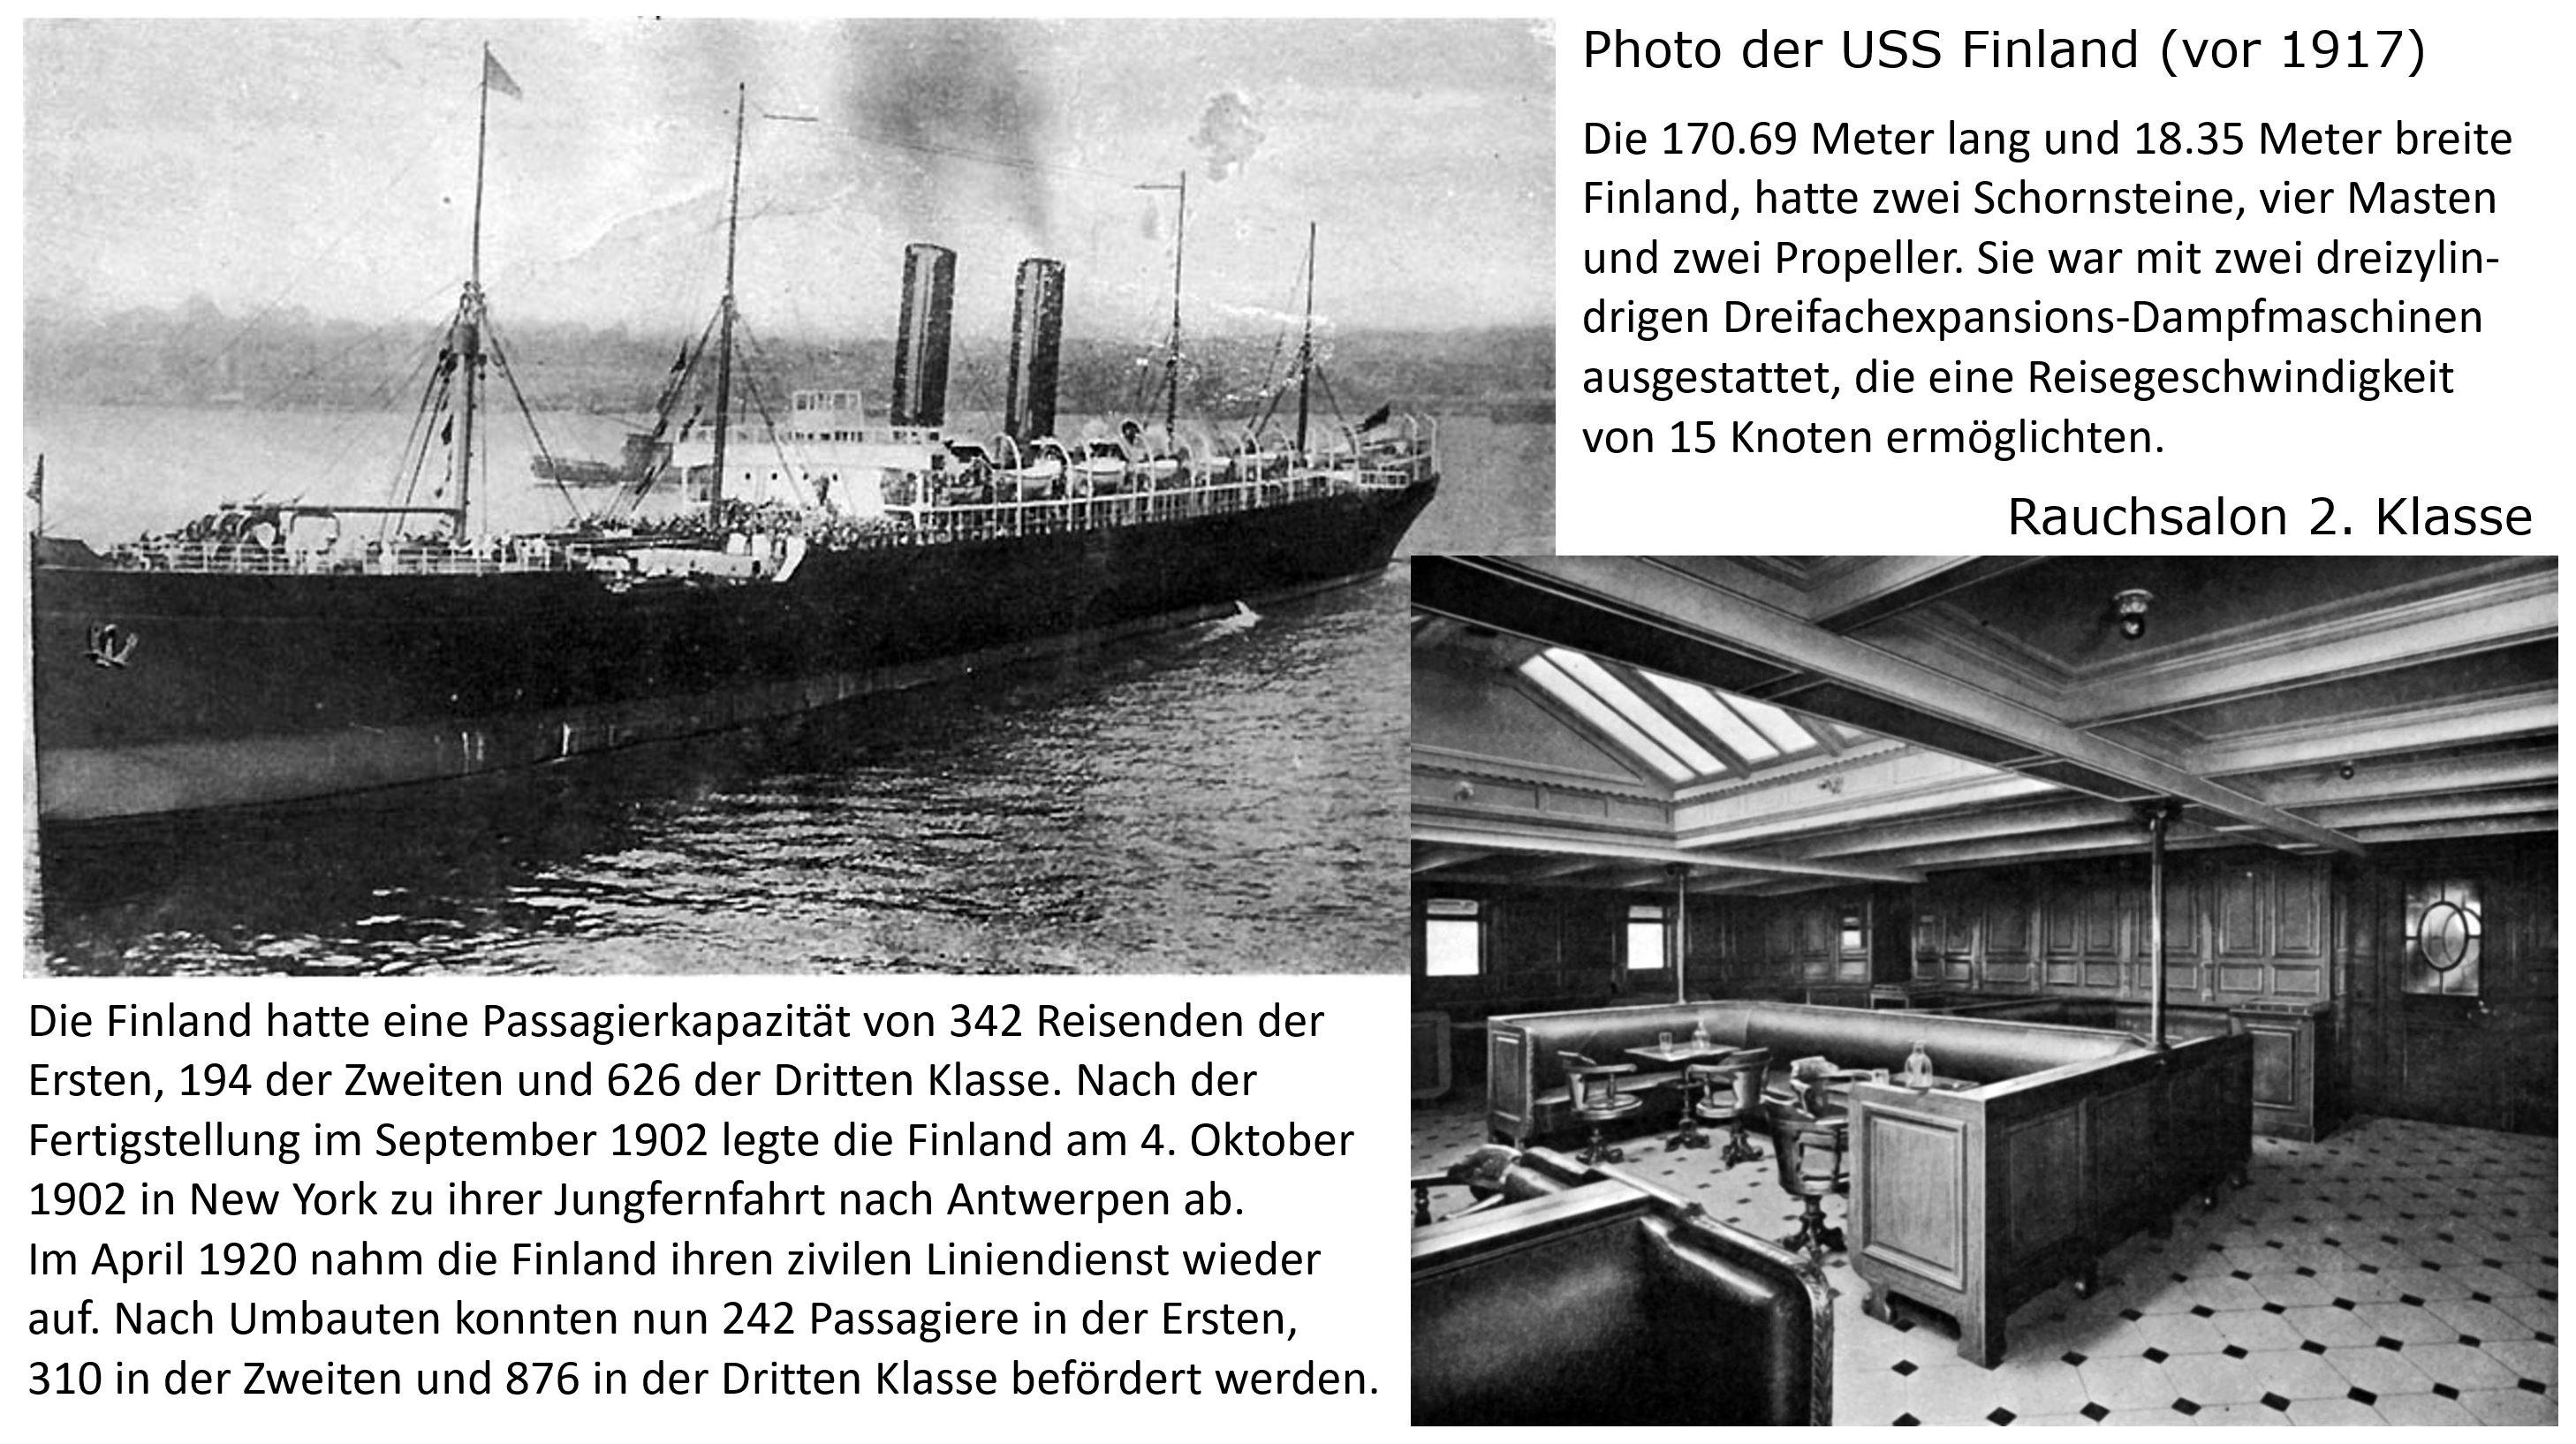 Auswanderung Johann Ulrich Weder (1921)